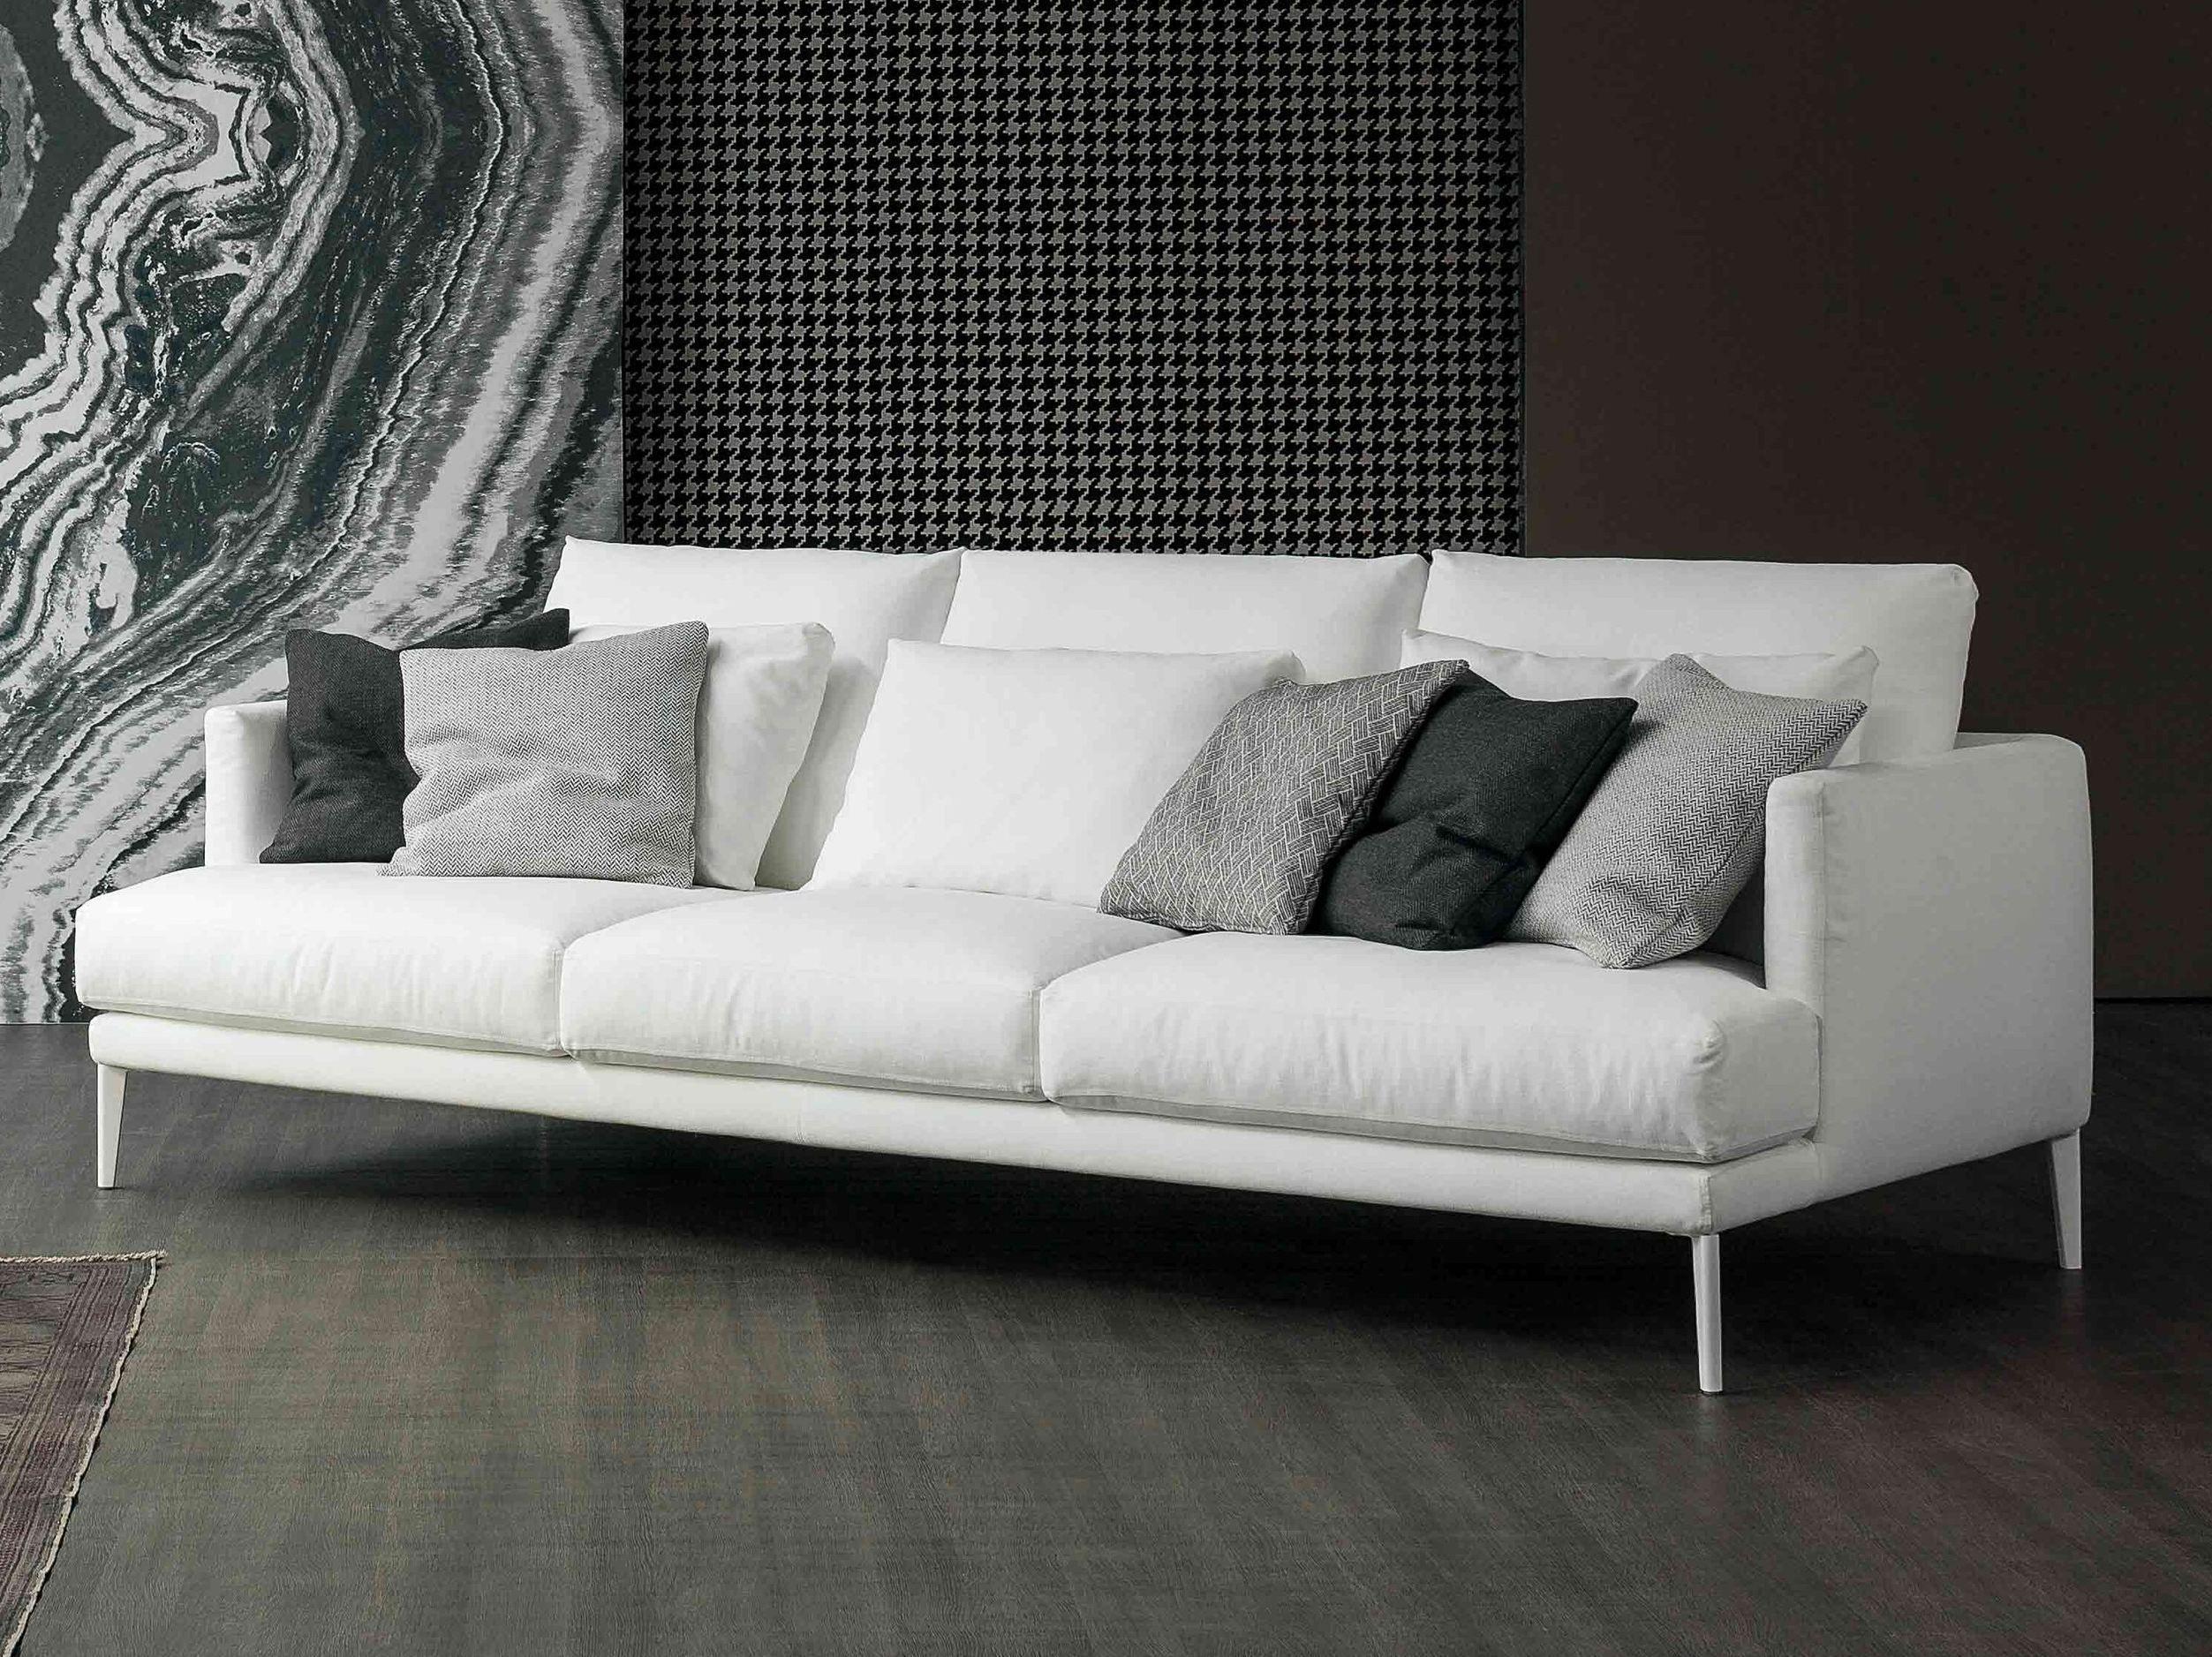 PARAISO Sofa by Bonaldo design Sergio Bicego | Sweet Home ...